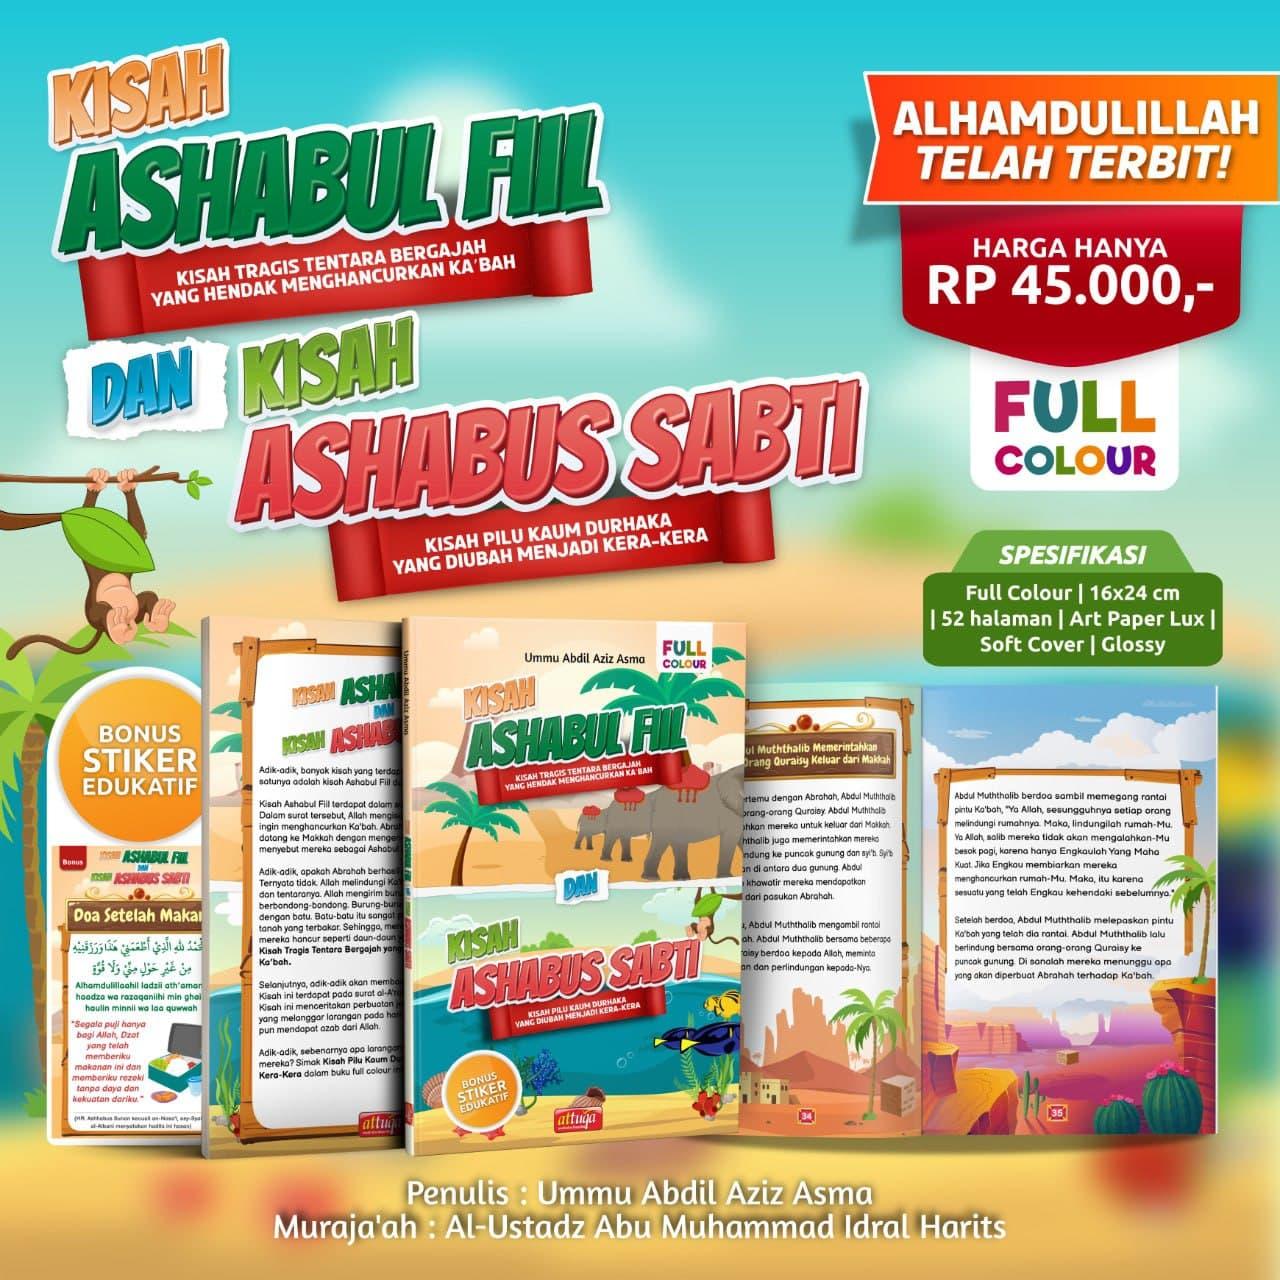 Buku Kisah Ashabul Fiil dan Ashabus Sabti Attuqa